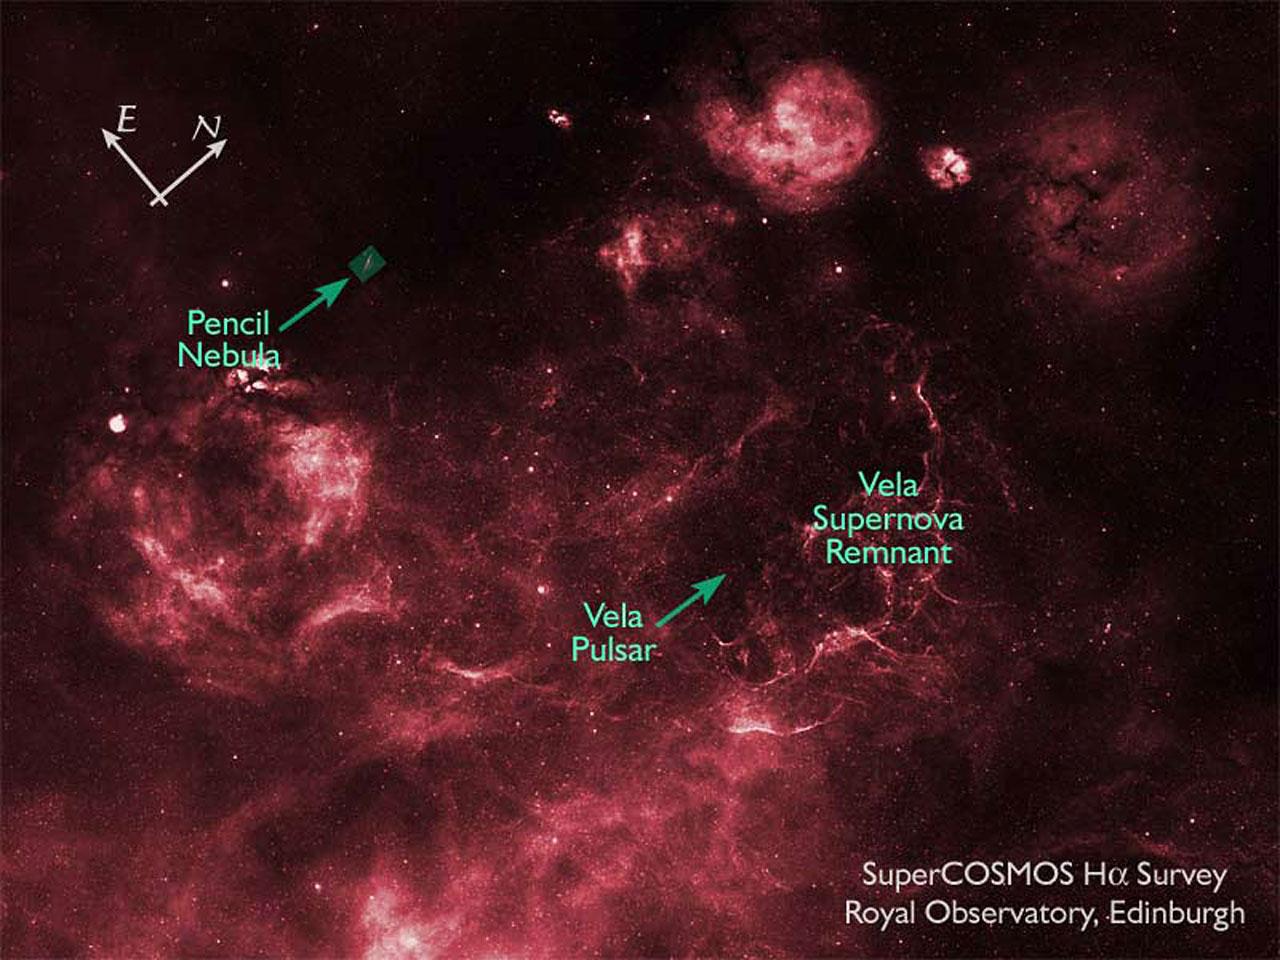 SuperCOSMOS H-alpha Survey (SHS) Image of Vela Supernova Remnant